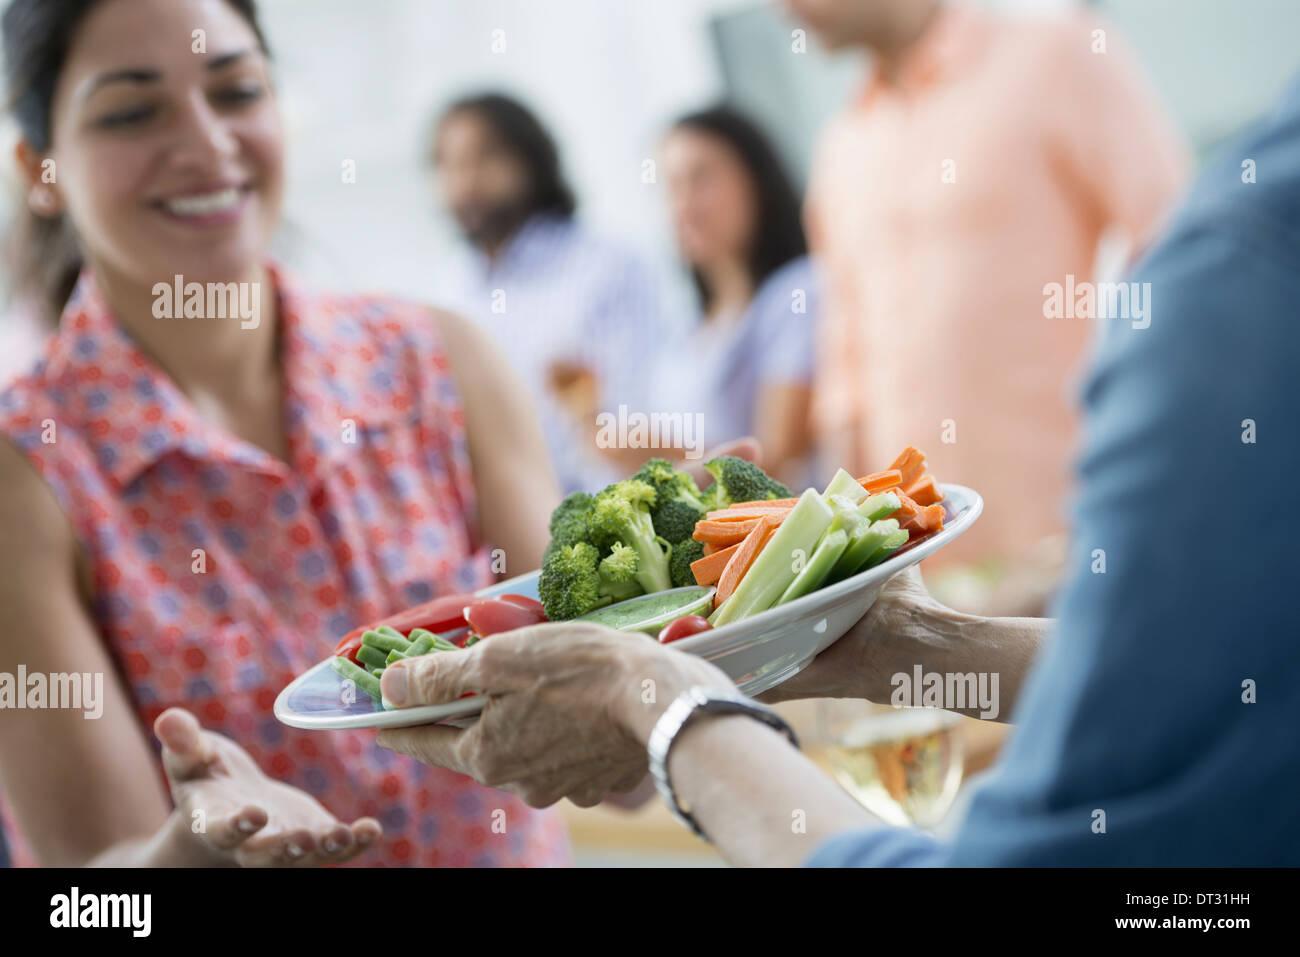 Buffet de ensaladas de diferentes edades y etnias reunidos Imagen De Stock